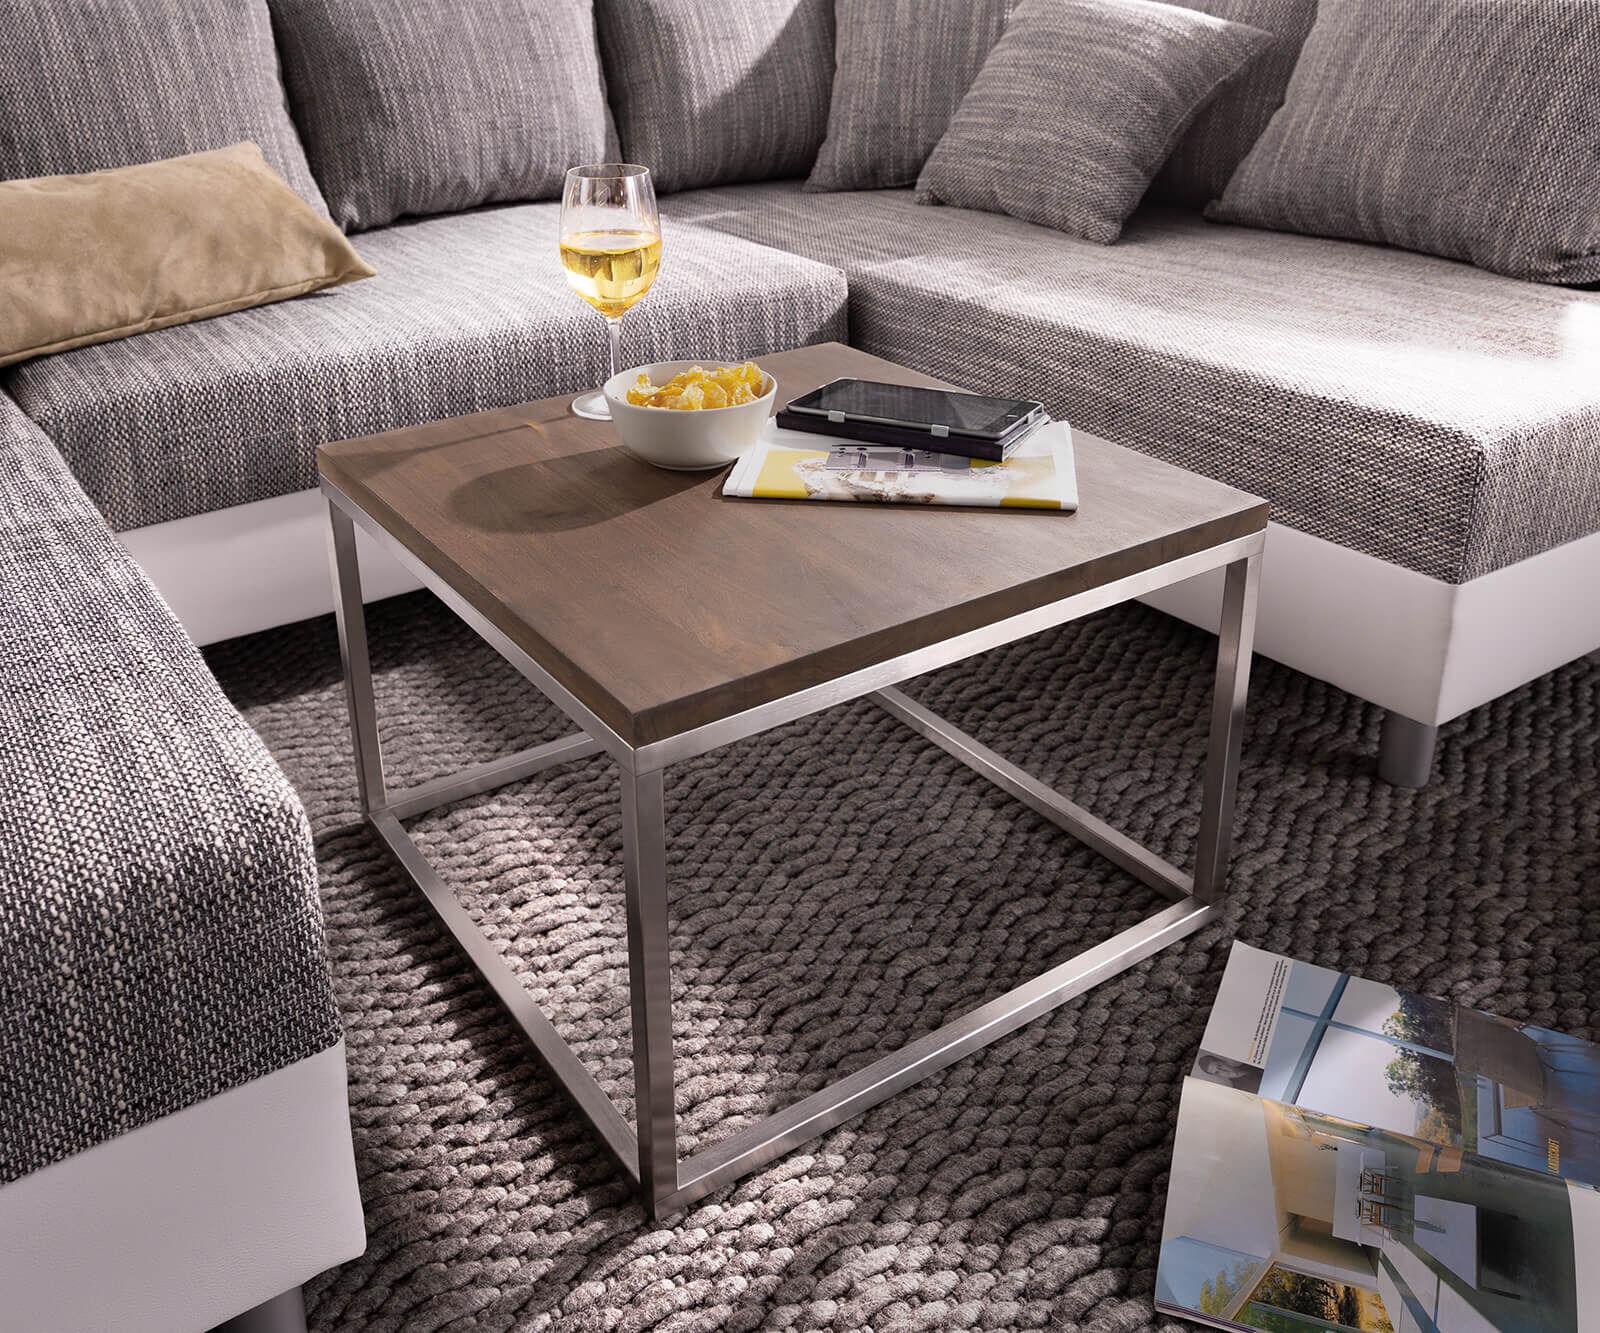 DELIFE Table-basse Tatius 60x60cm cadre acacia brun acier inoxydable